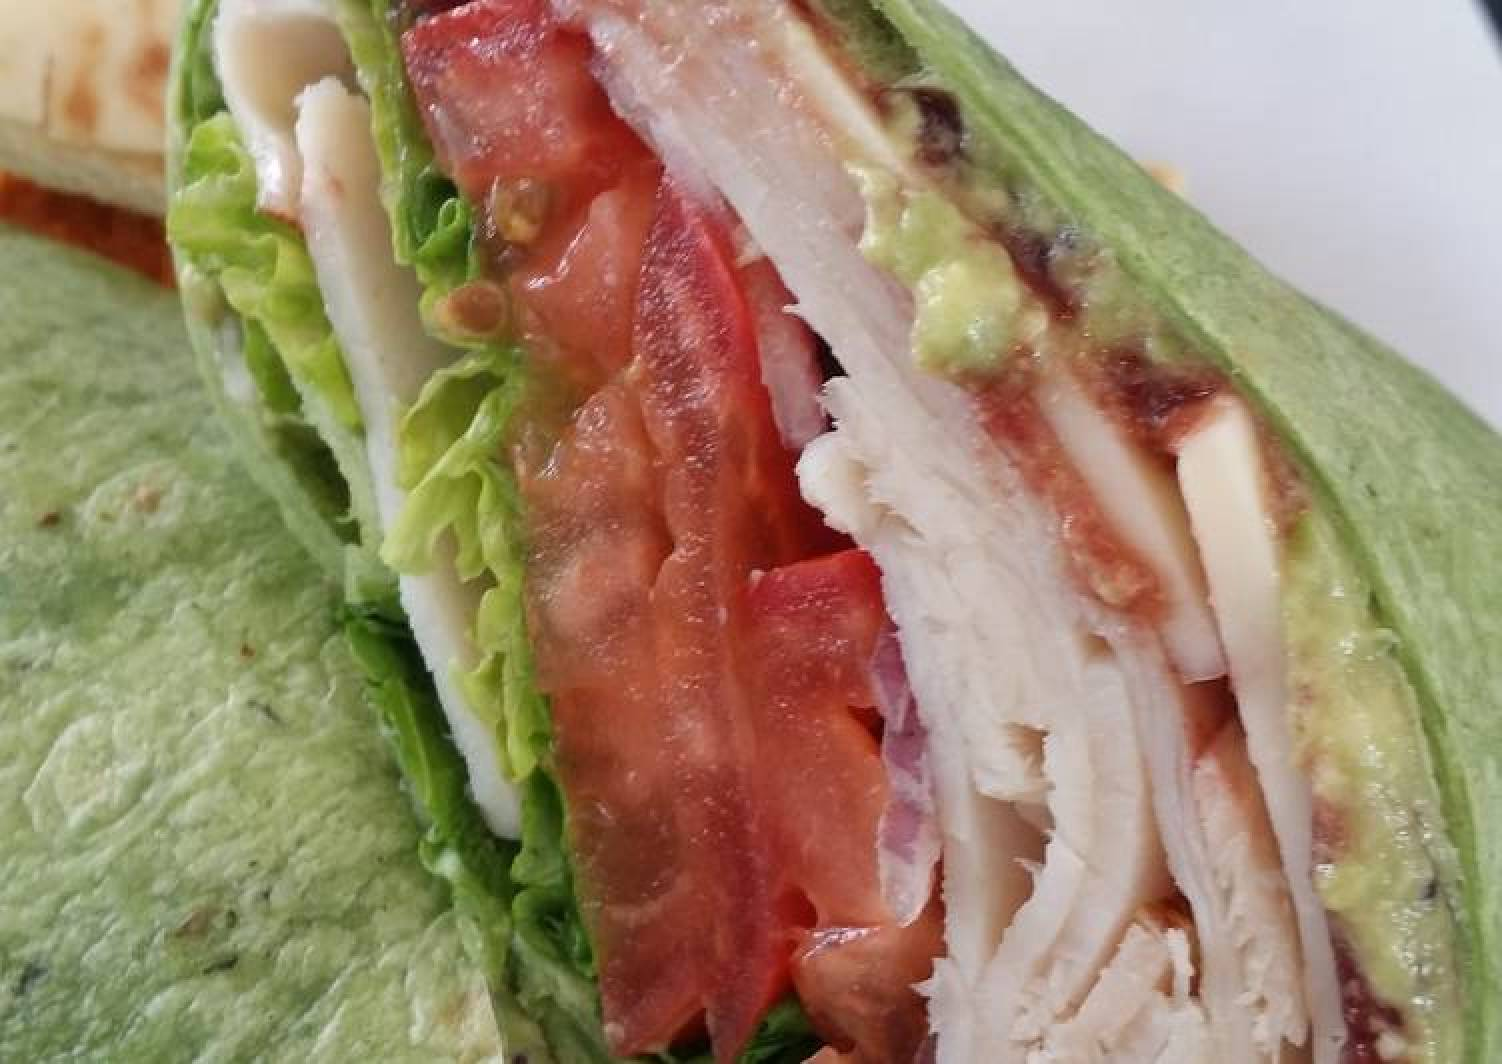 Leftover roasted turkey sandwich wrap